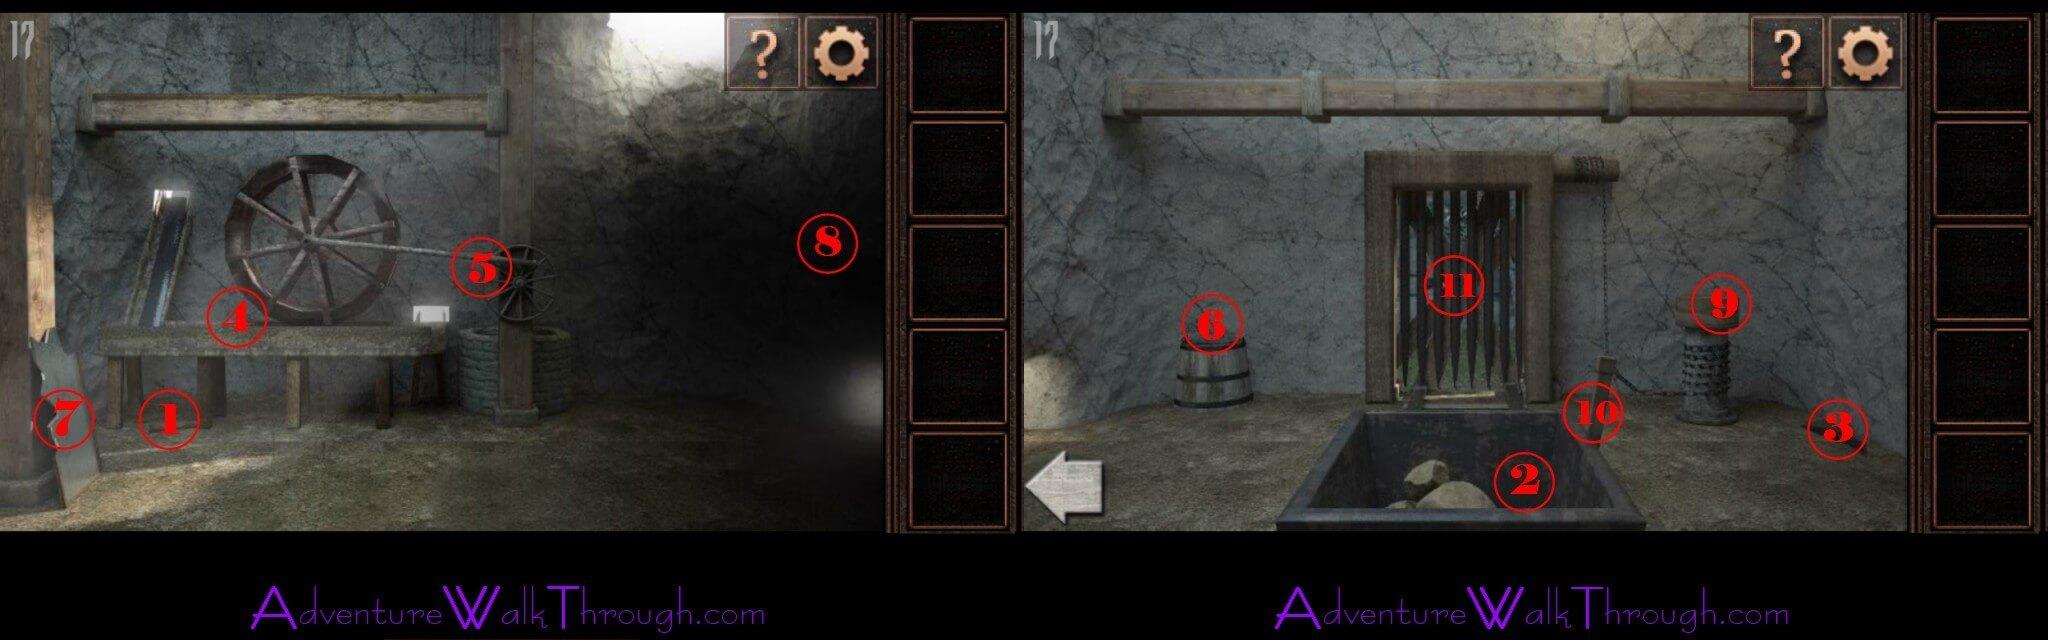 The Dark Room Escape Walkthrough